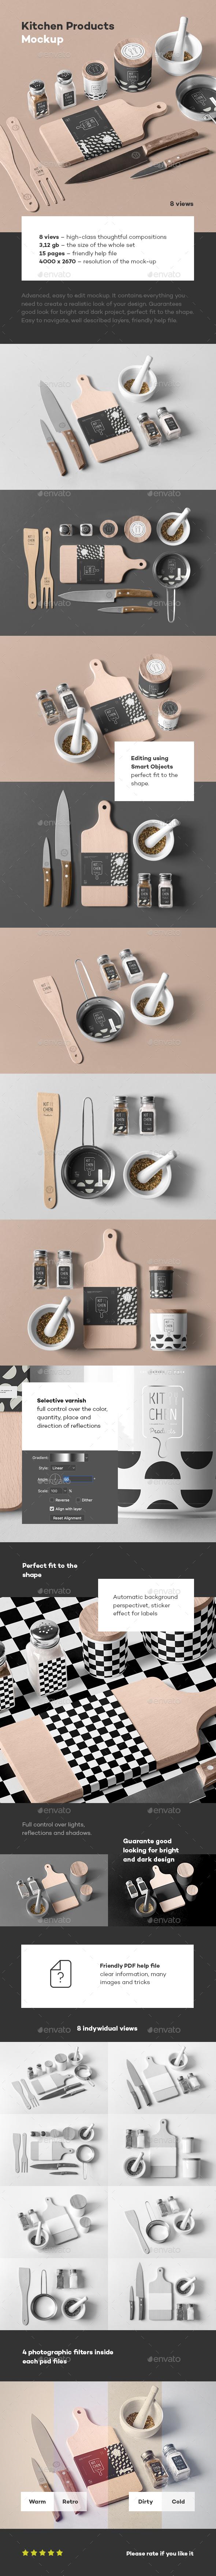 Kitchen Branding Mock-up